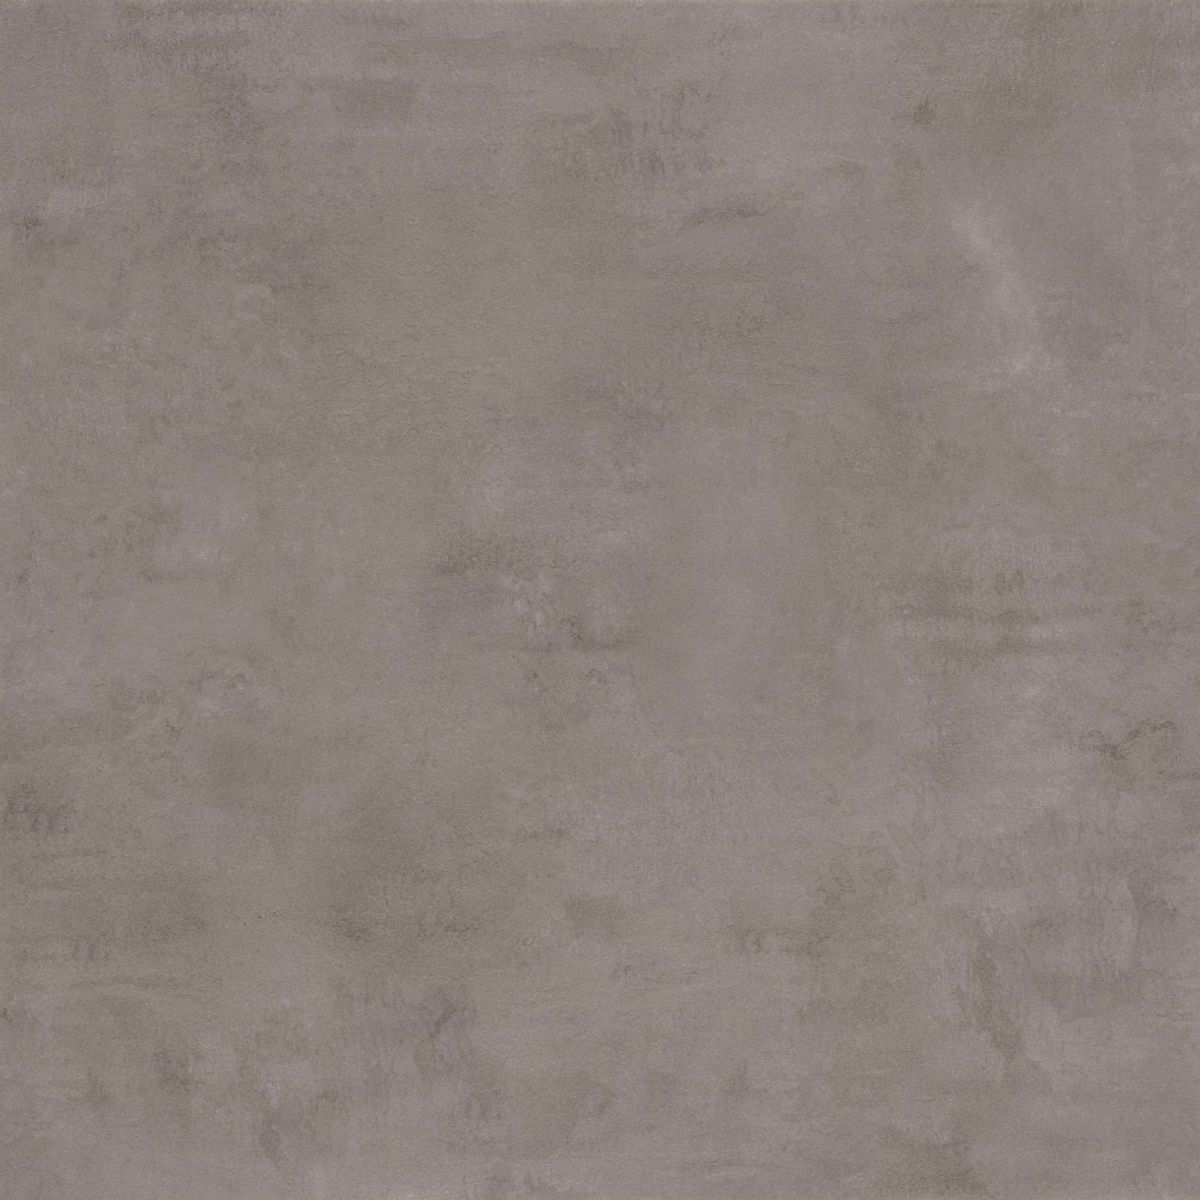 Sol vinyle béton anthracite Gubbio 400cm